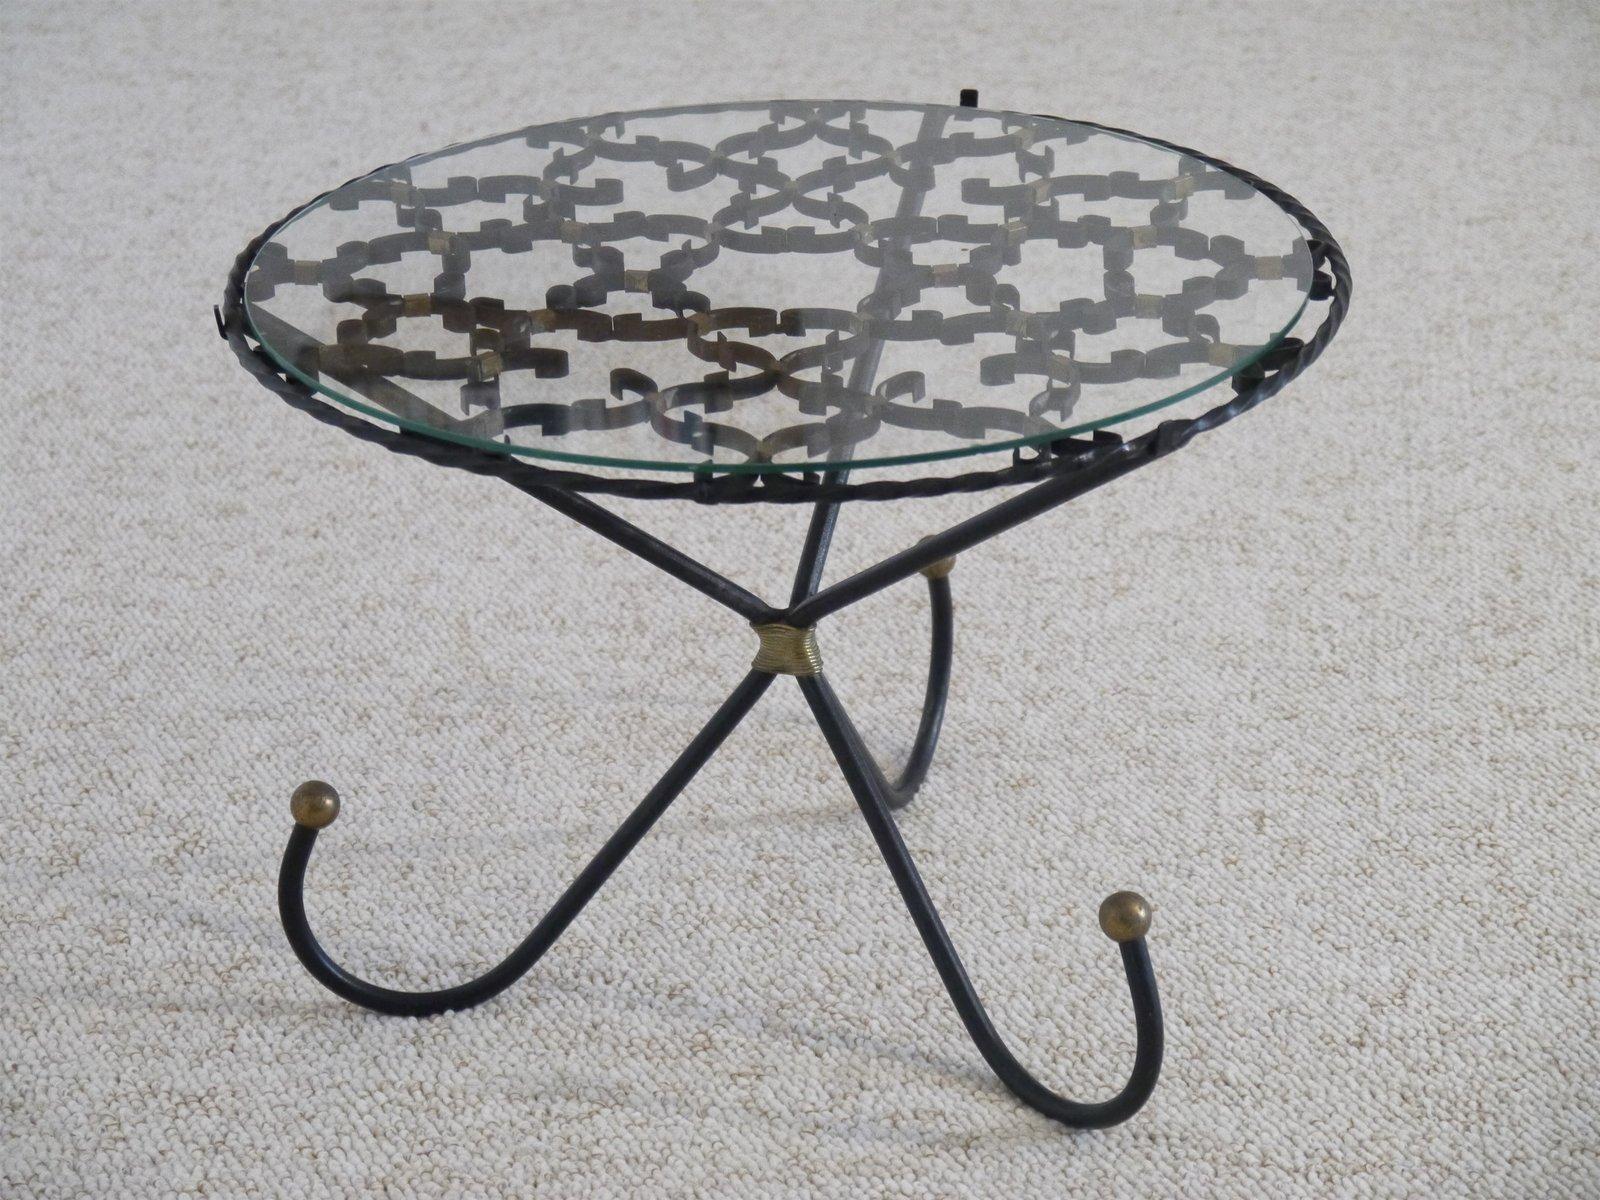 franz sischer beistelltisch aus metall messing 1950er. Black Bedroom Furniture Sets. Home Design Ideas